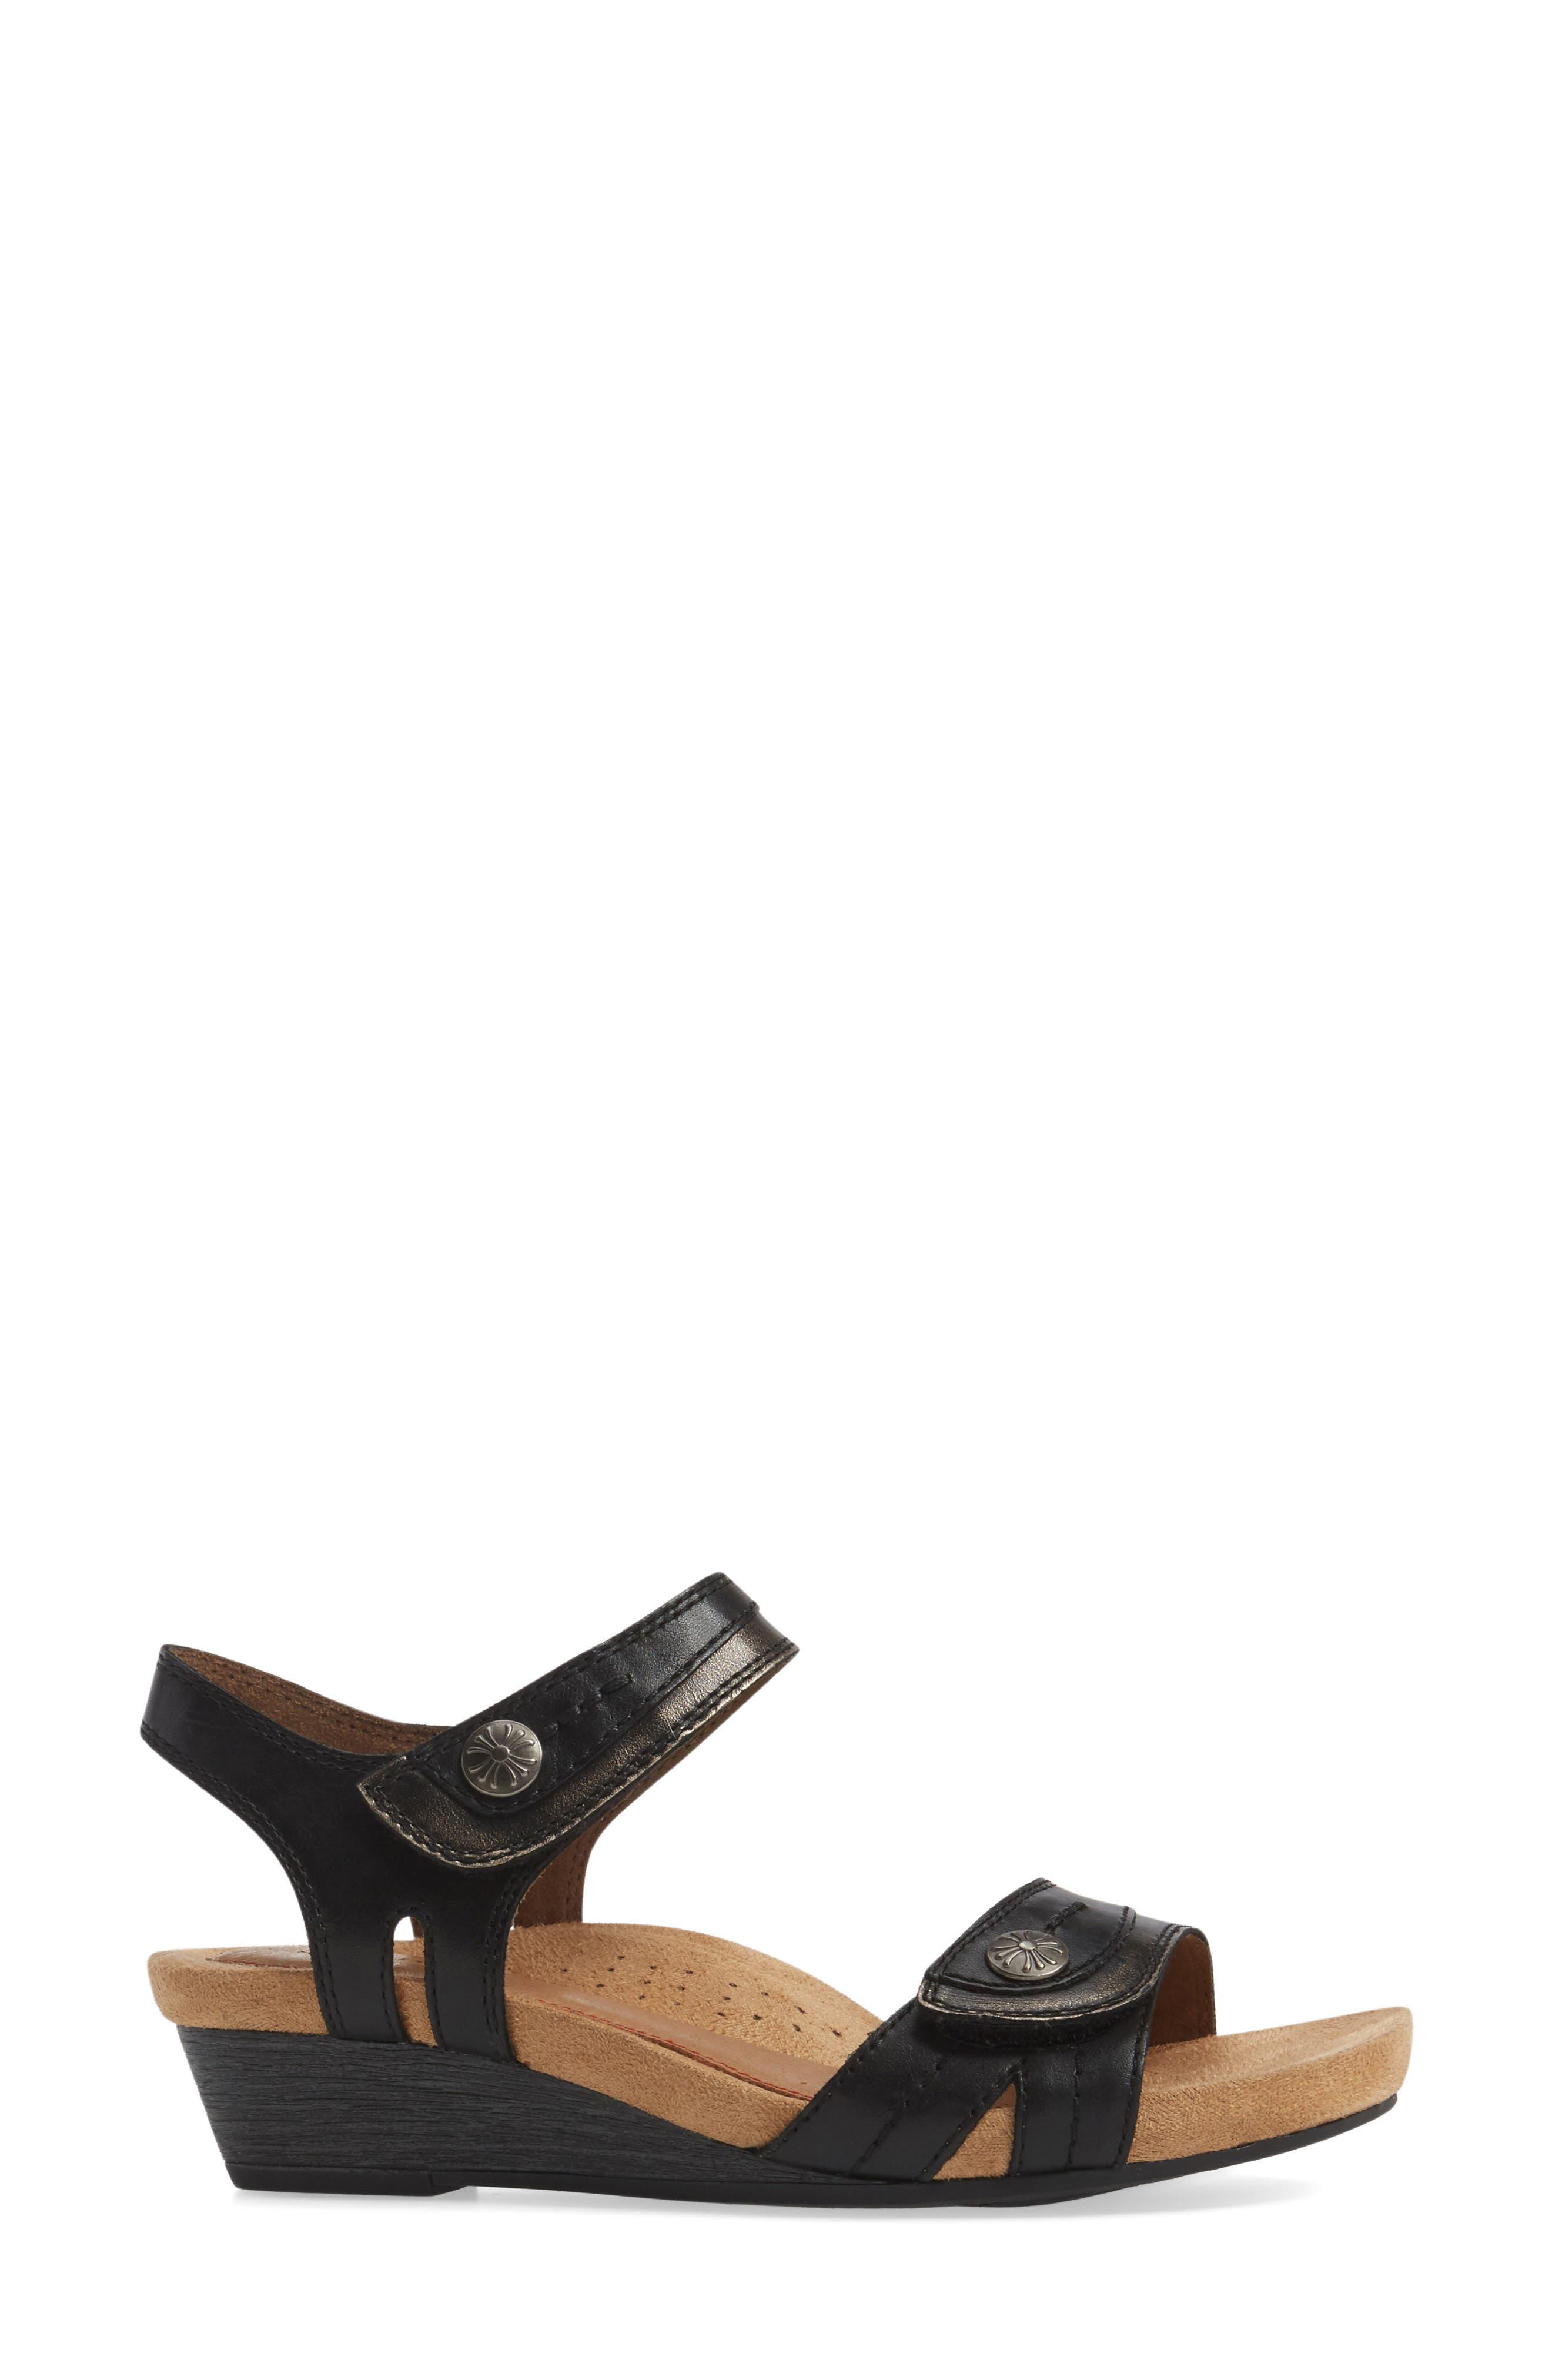 Hollywood Wedge Sandal,                             Alternate thumbnail 3, color,                             BLACK LEATHER